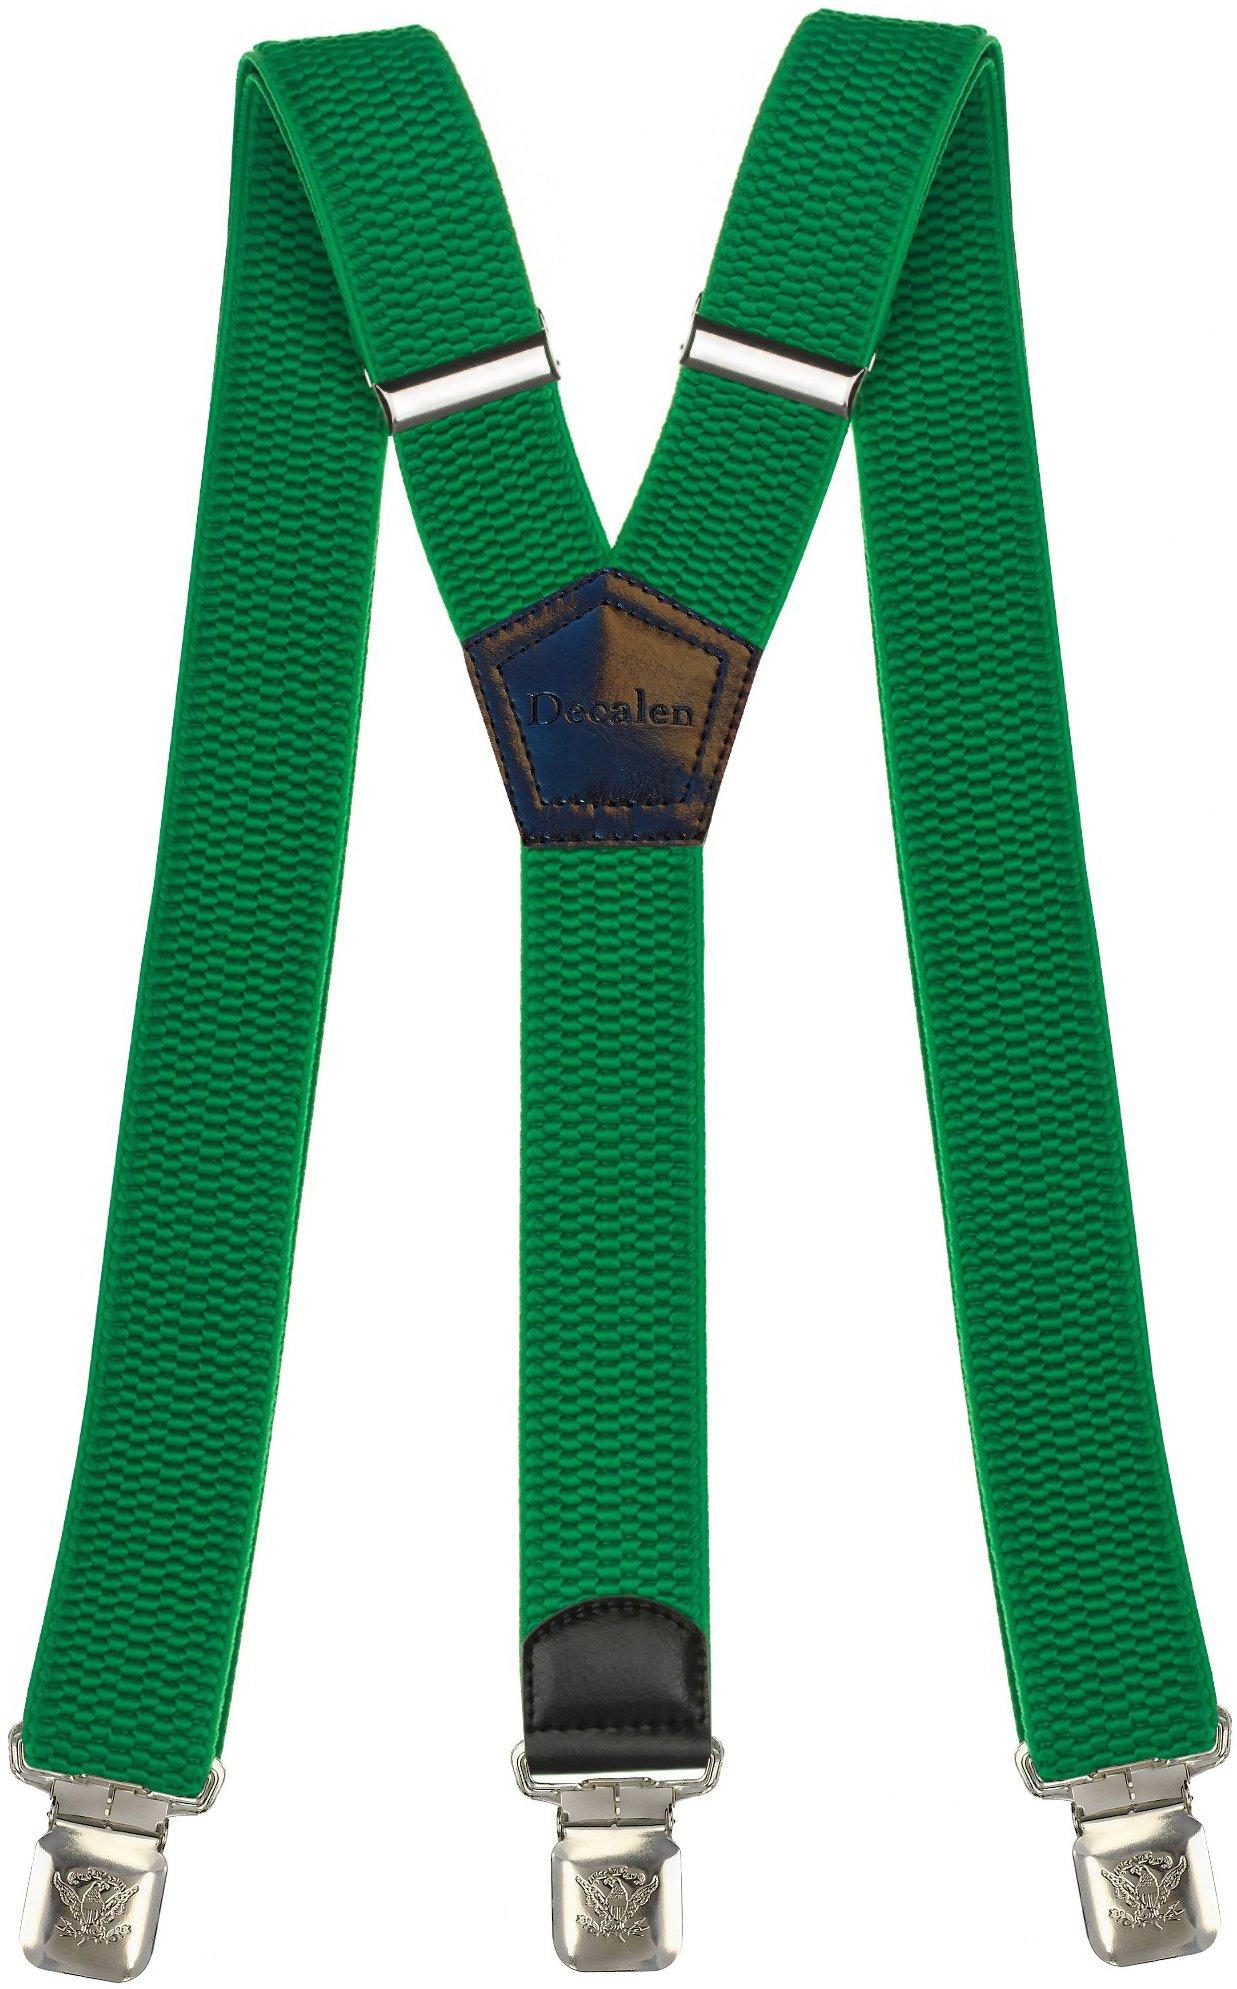 Msendro Men's Suspenders Y Shape Adjustable Elastic Heavy Duty Clip on Braces X-Large Green